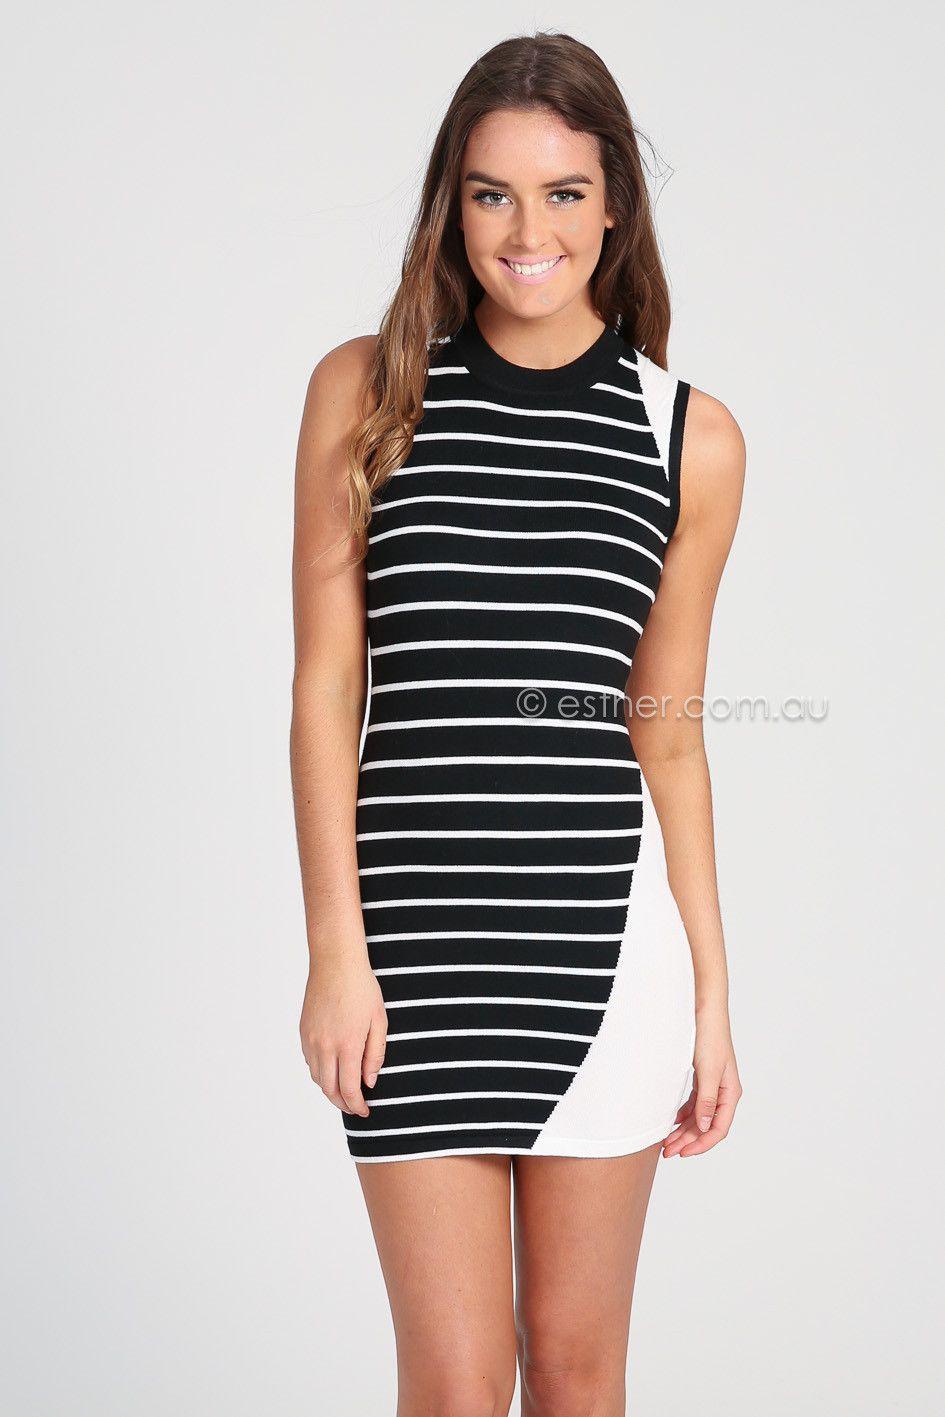 quinn knitted dress - black - sale